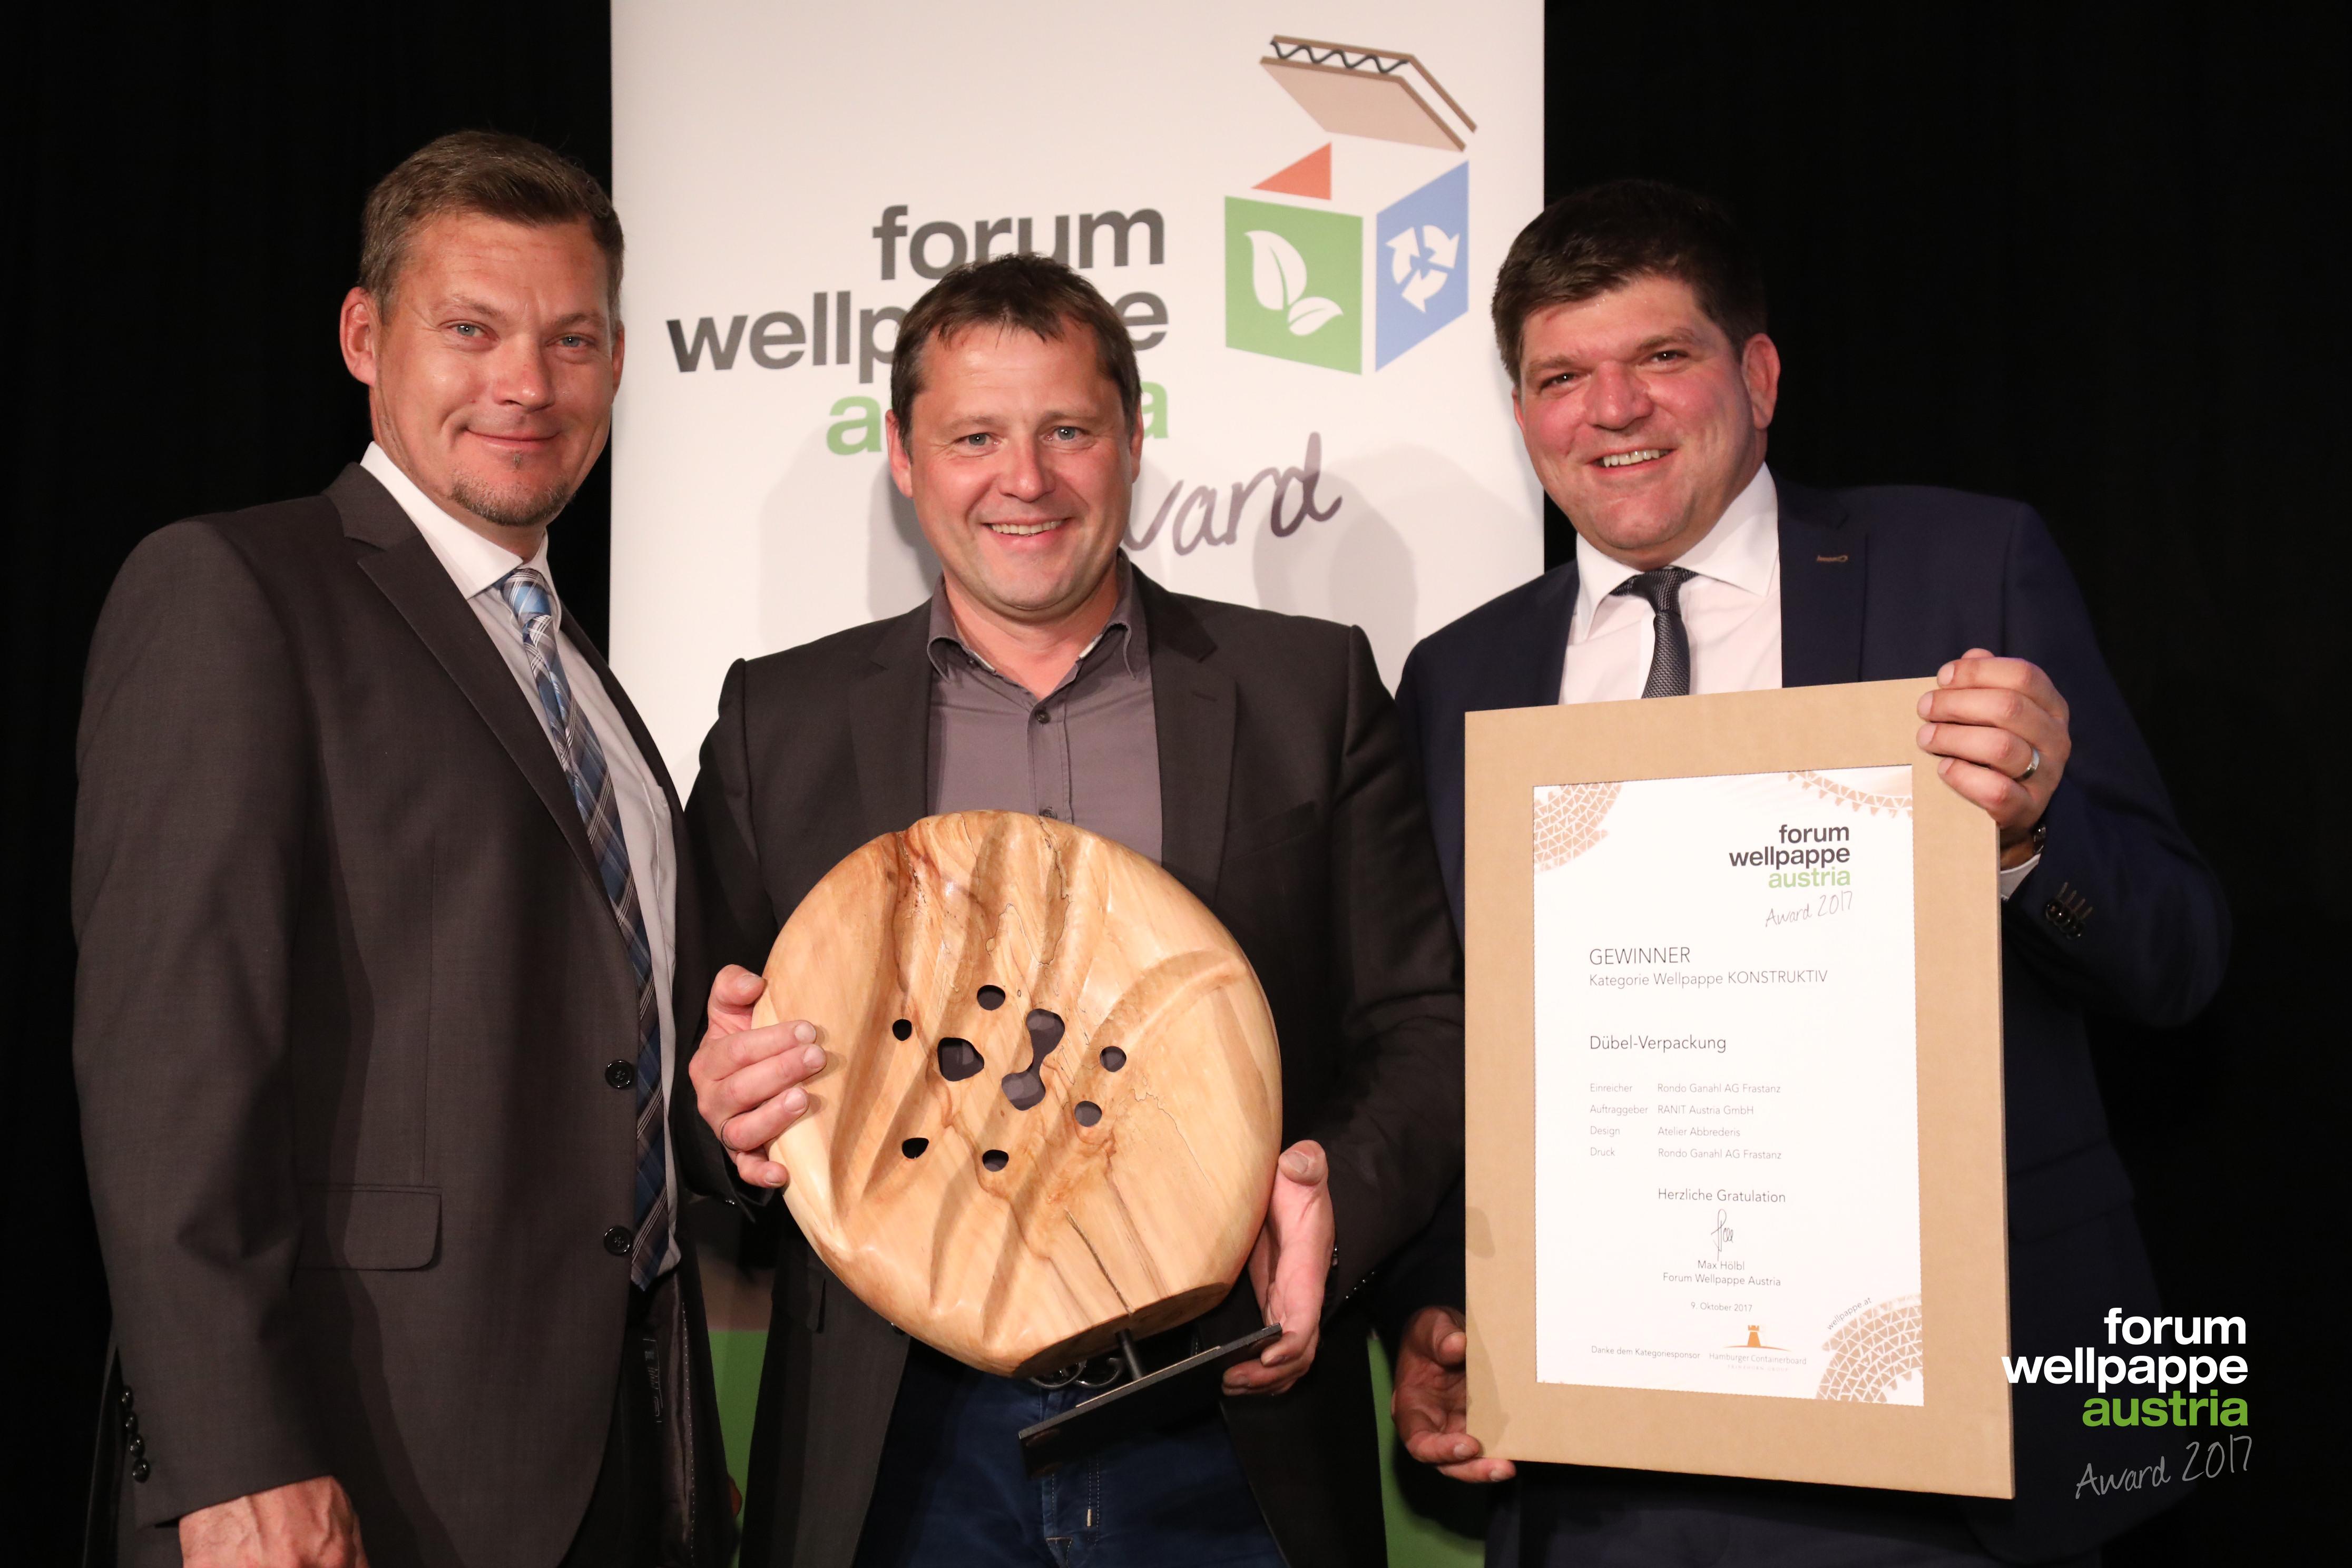 Wellpappe Award 2017 Gewinner Konstruktiv J. Krenn Hamburger Containerboard H. Keckeis Ranit S. Kaar Rondo Ganahl © L. Schedl